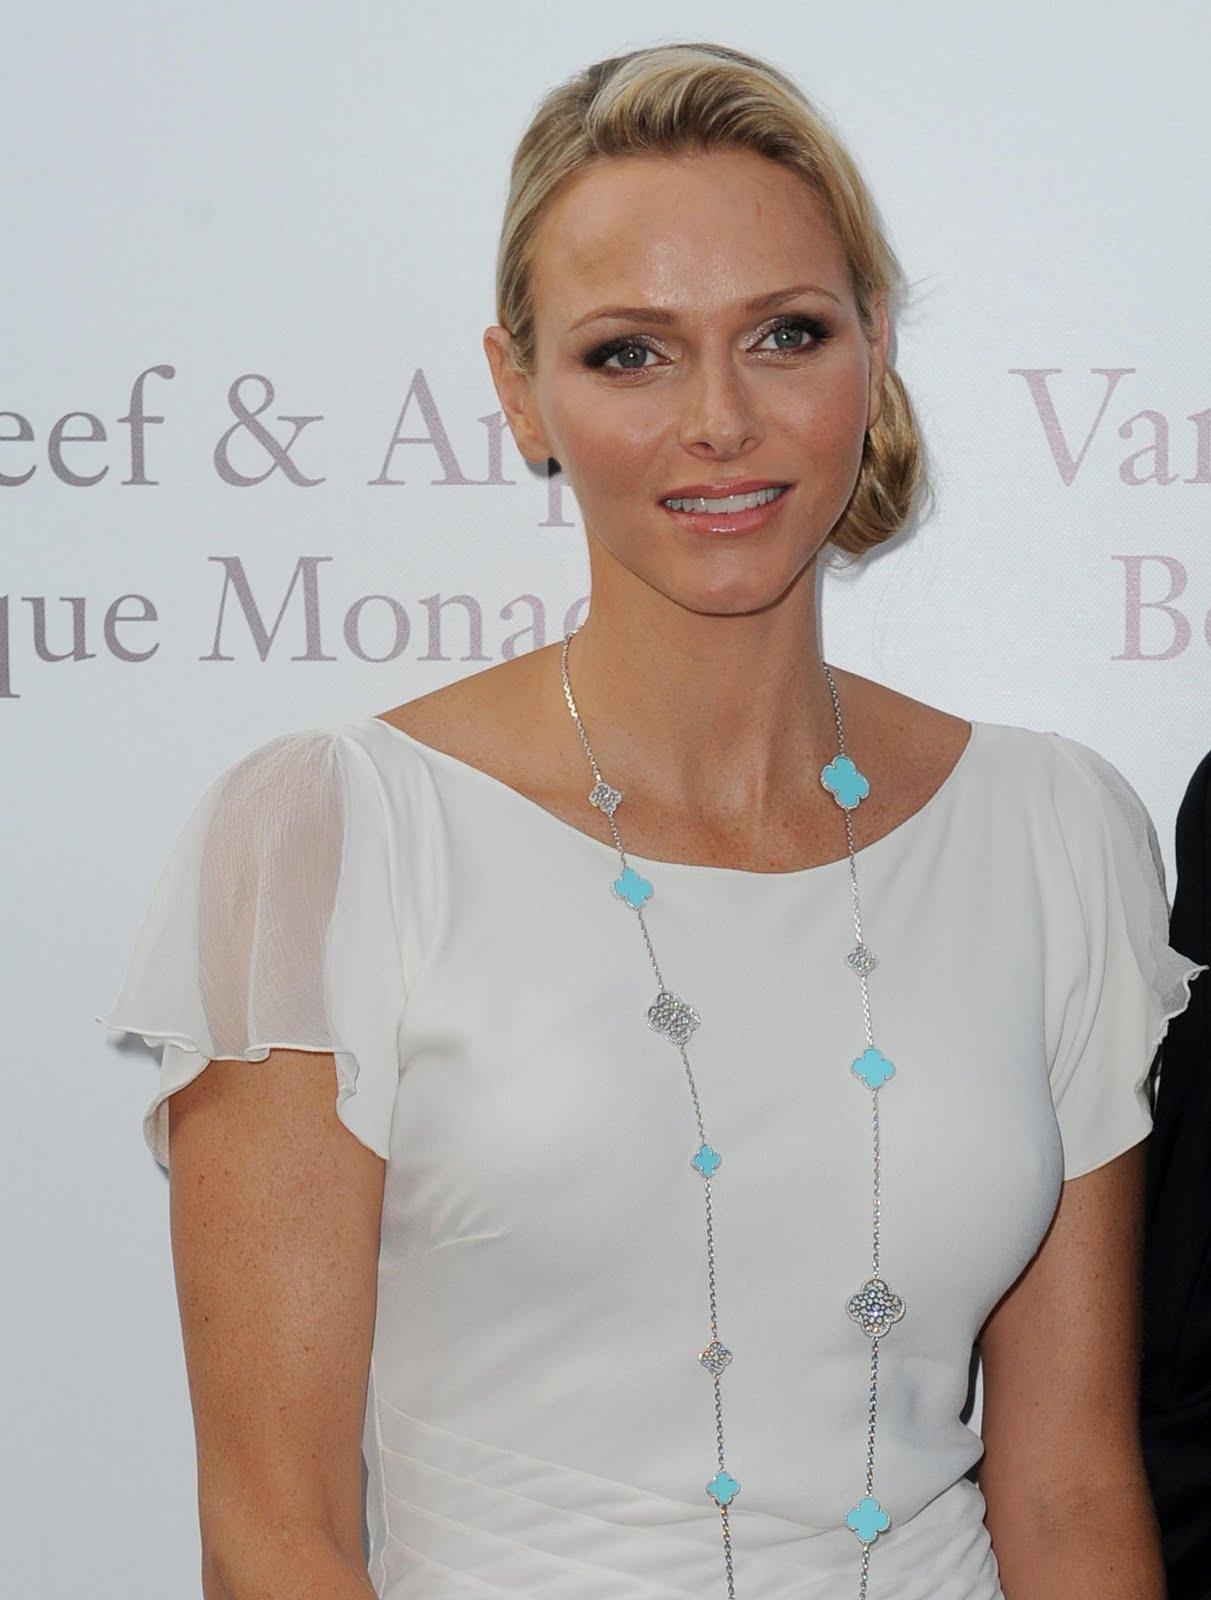 Monaco Boutique Inauguration_Princess Charlene Alhambra set_2